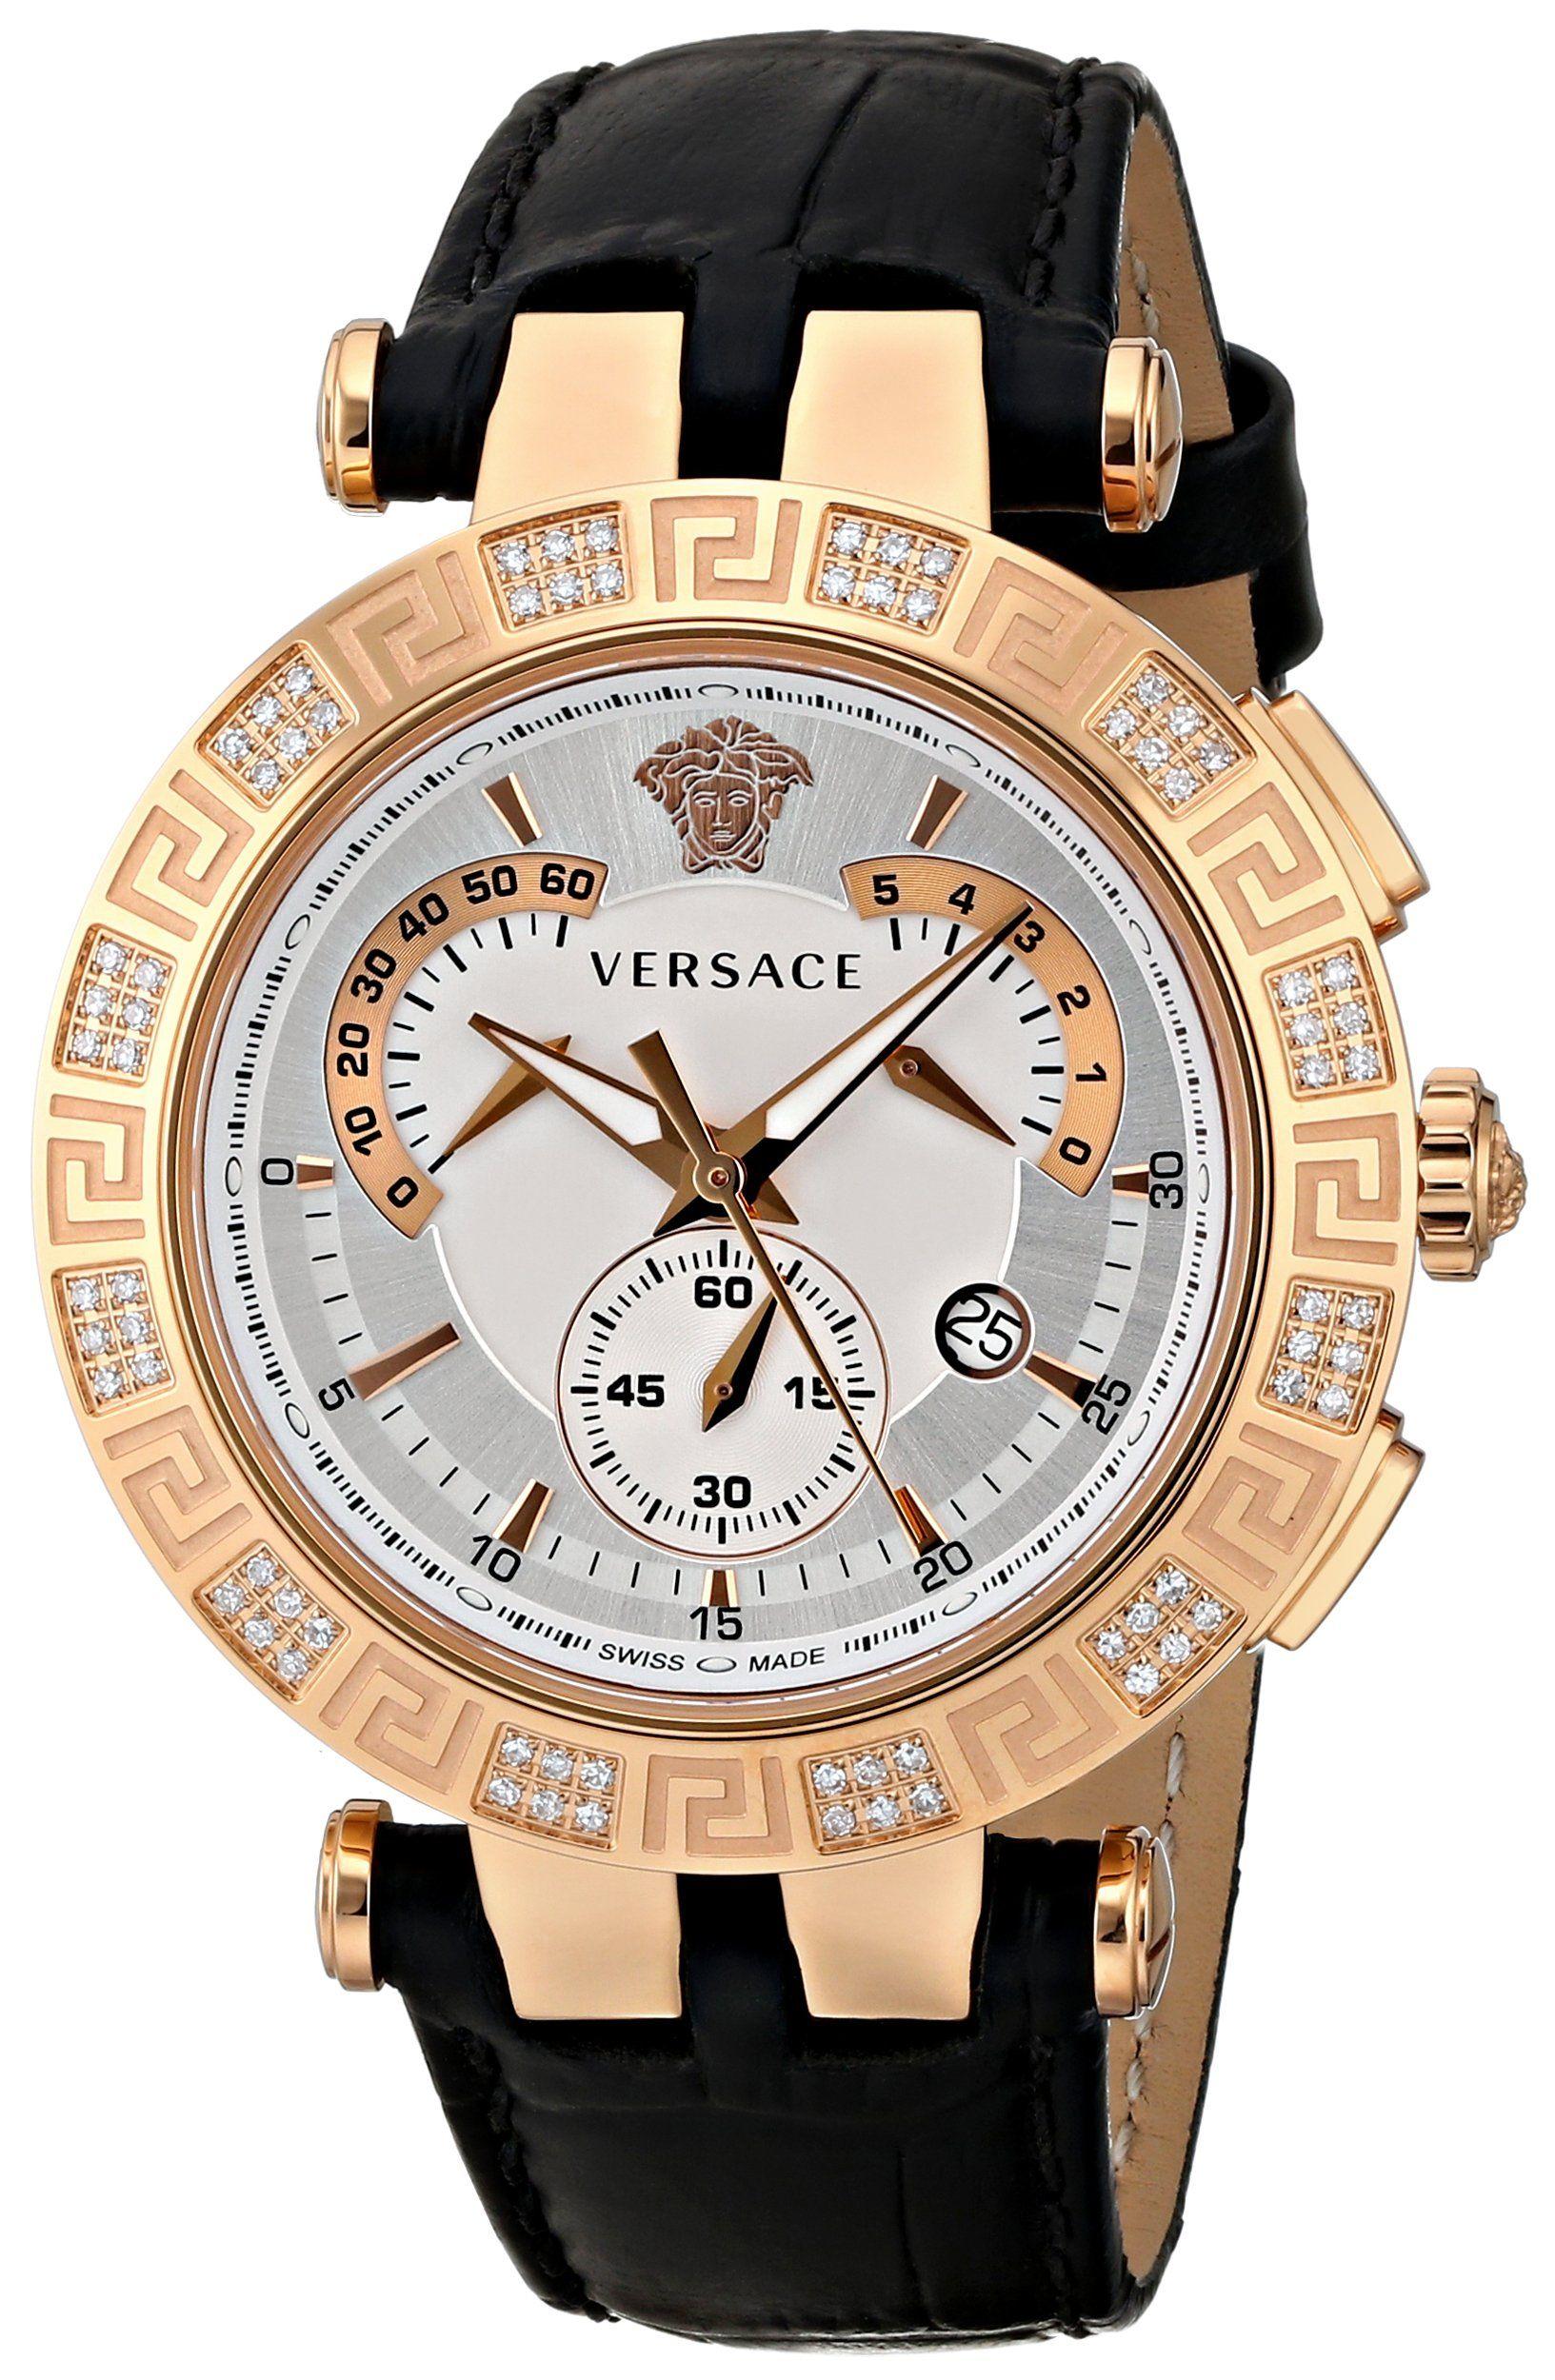 Versace Men's 23C82D002 S009 V-RACE CHRONO Analog Display Swiss Quartz Black Watch